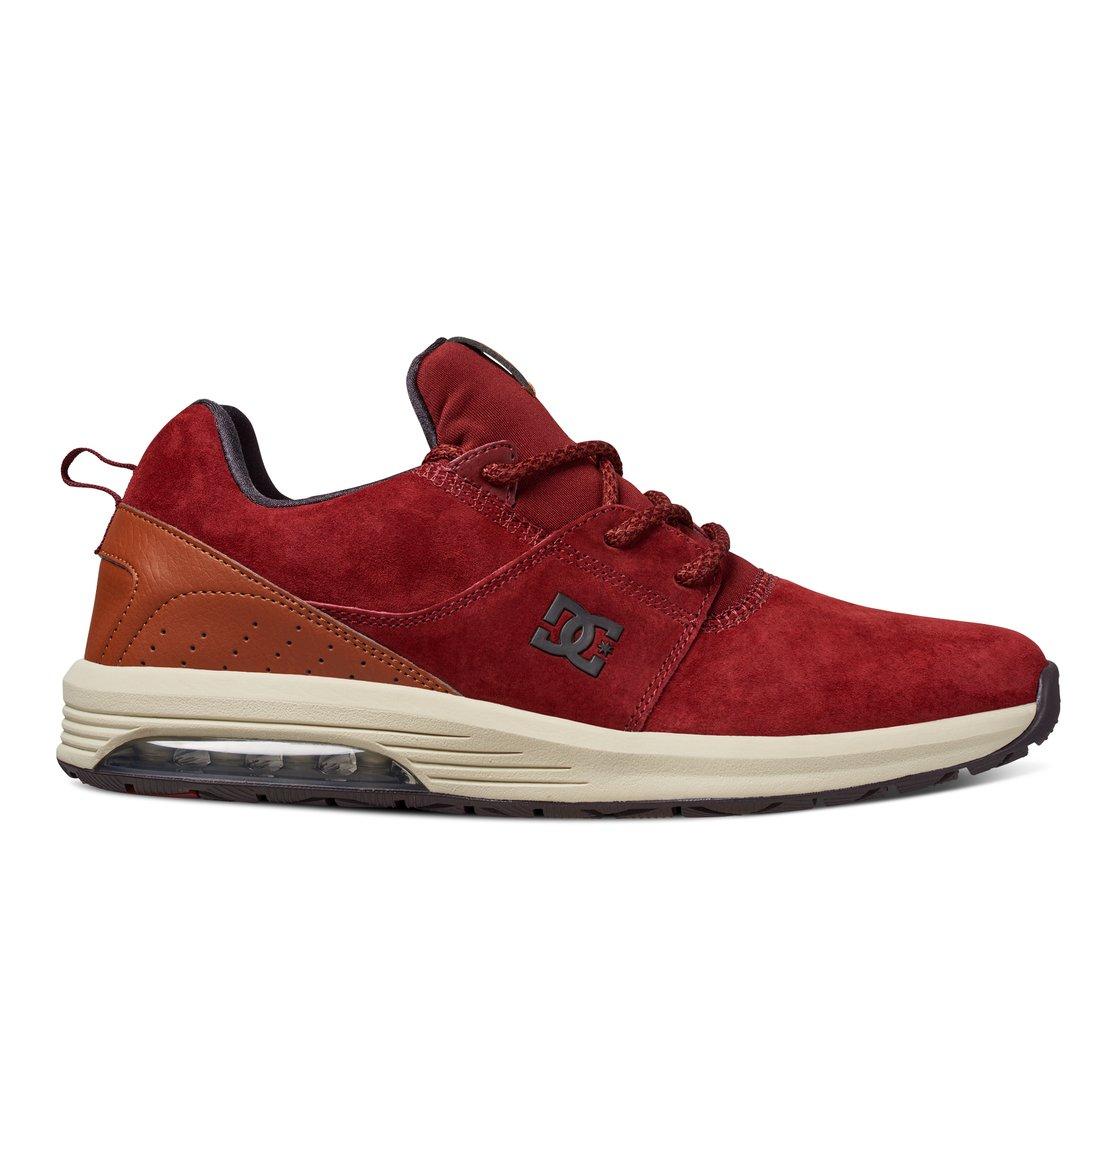 Men's Heathrow IA Skate Shoe